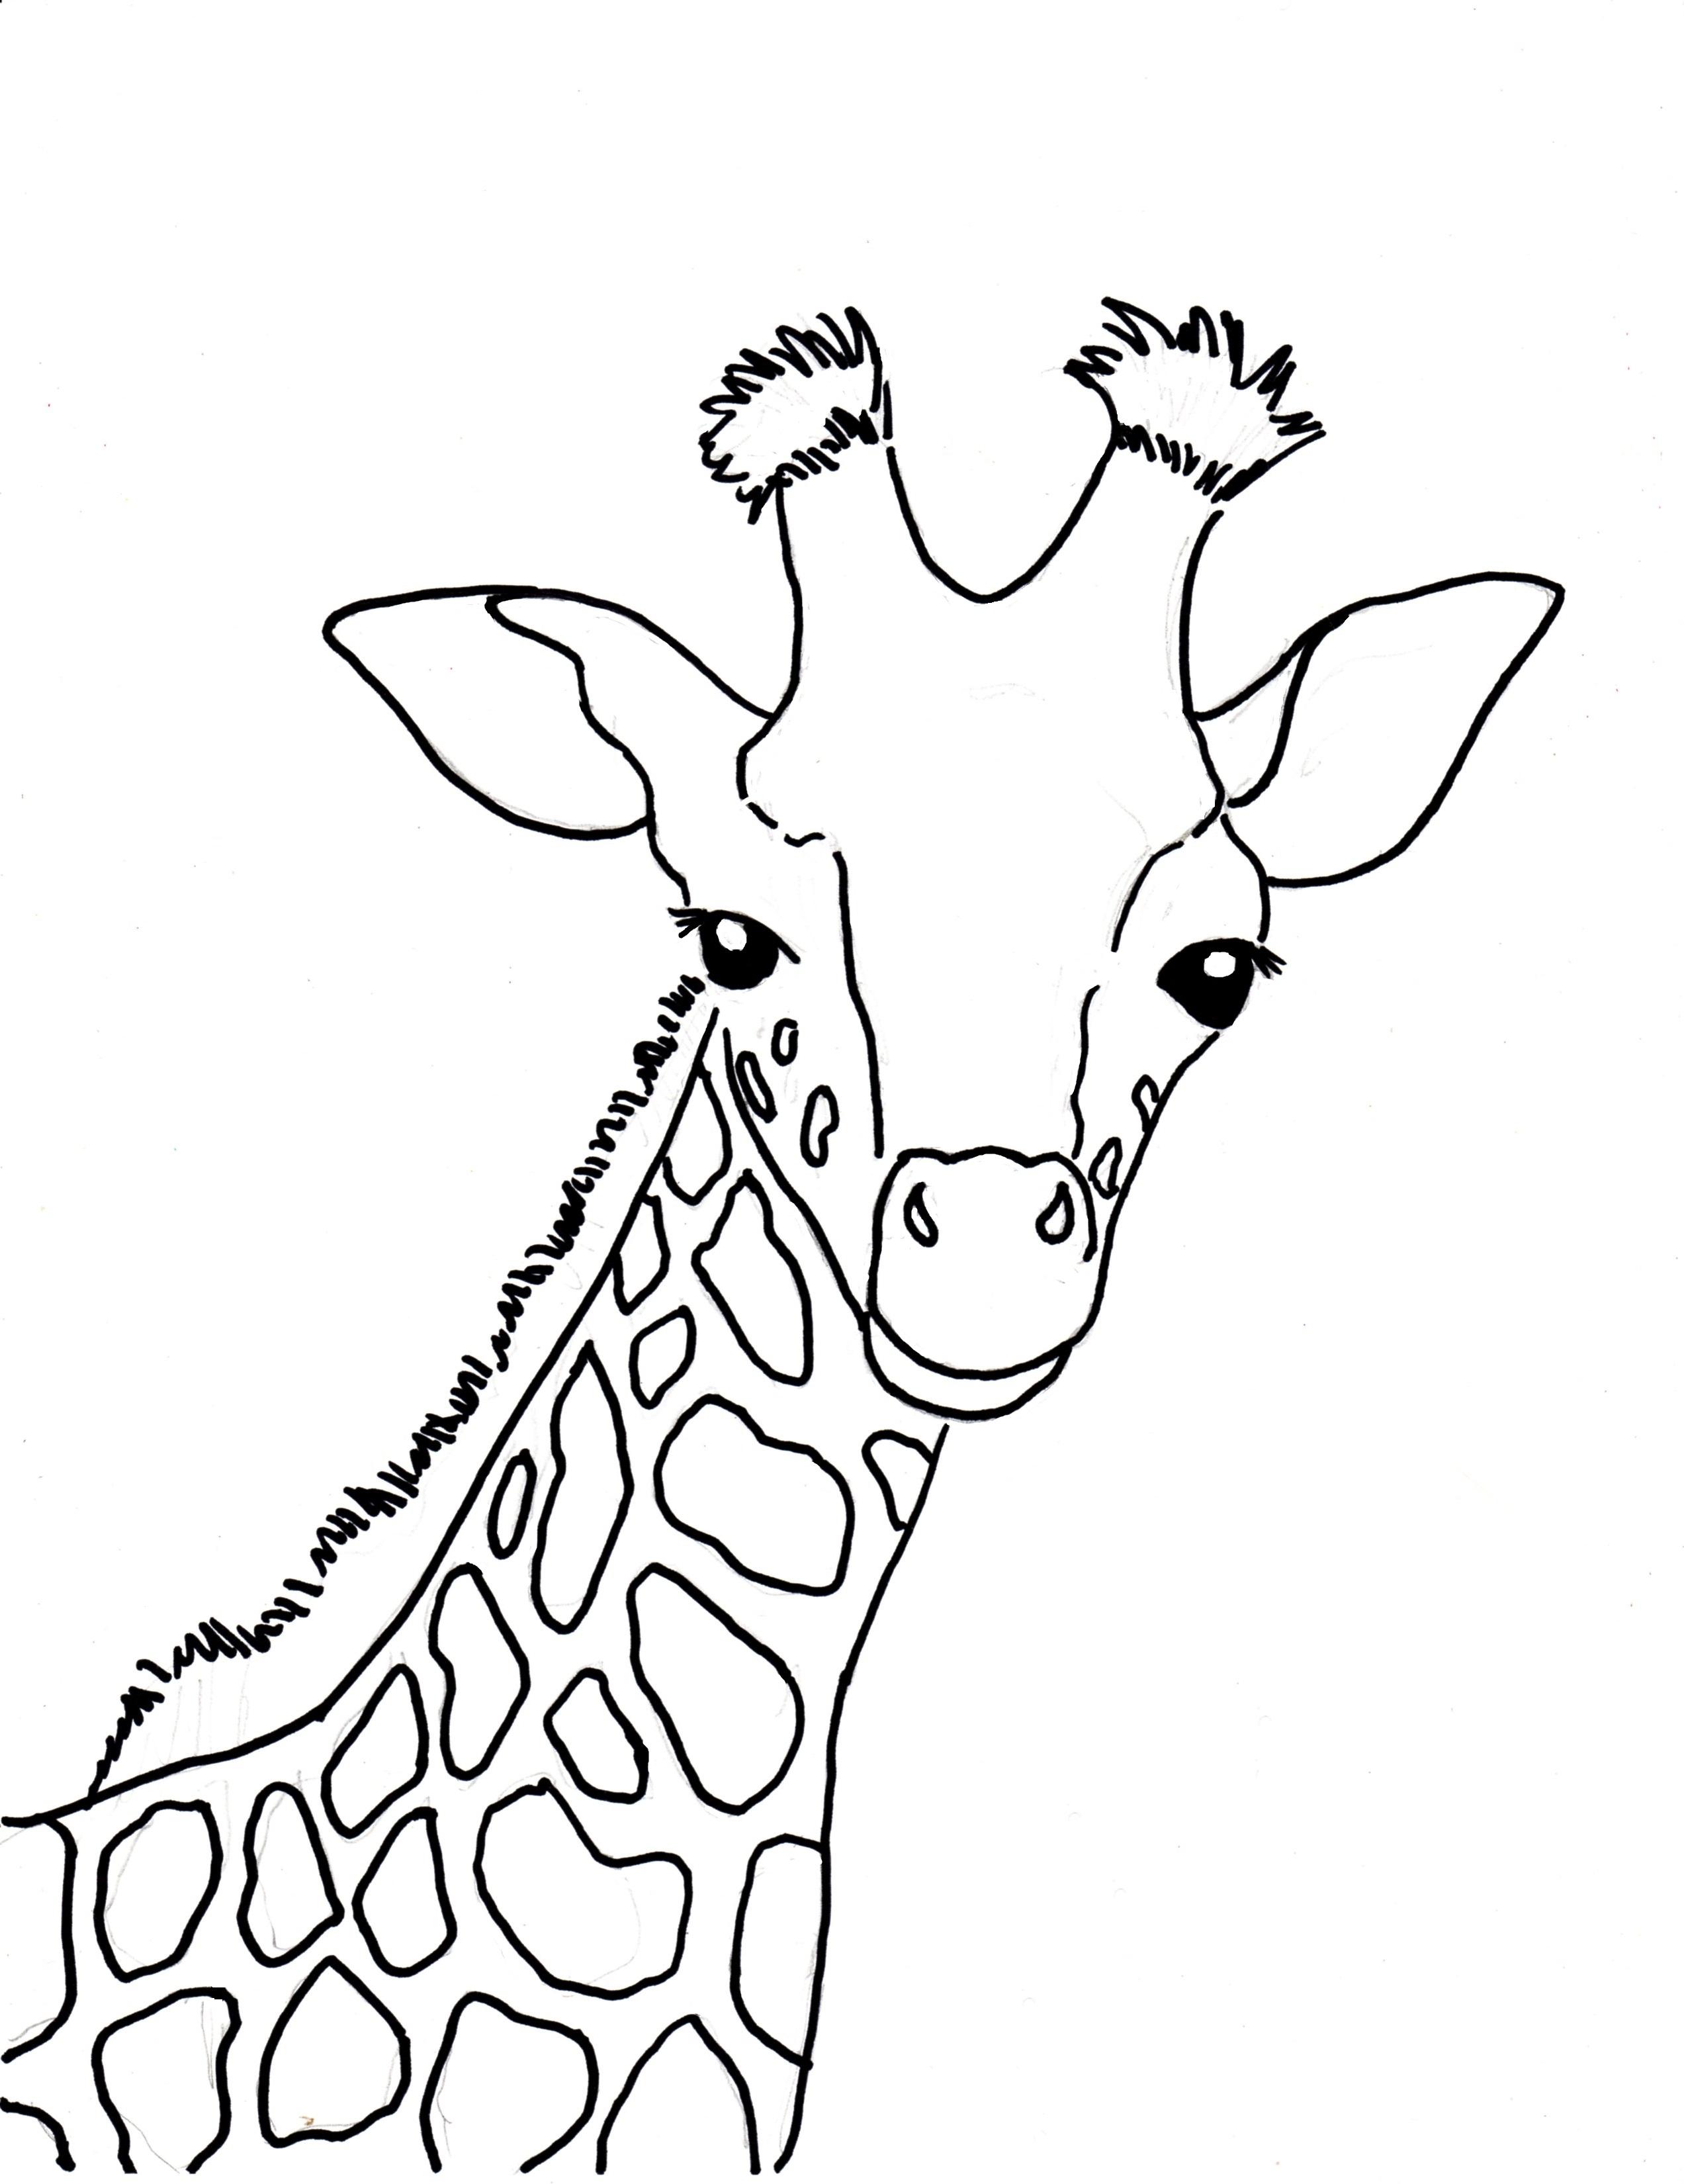 Giraffe Drawing Outline At Getdrawings